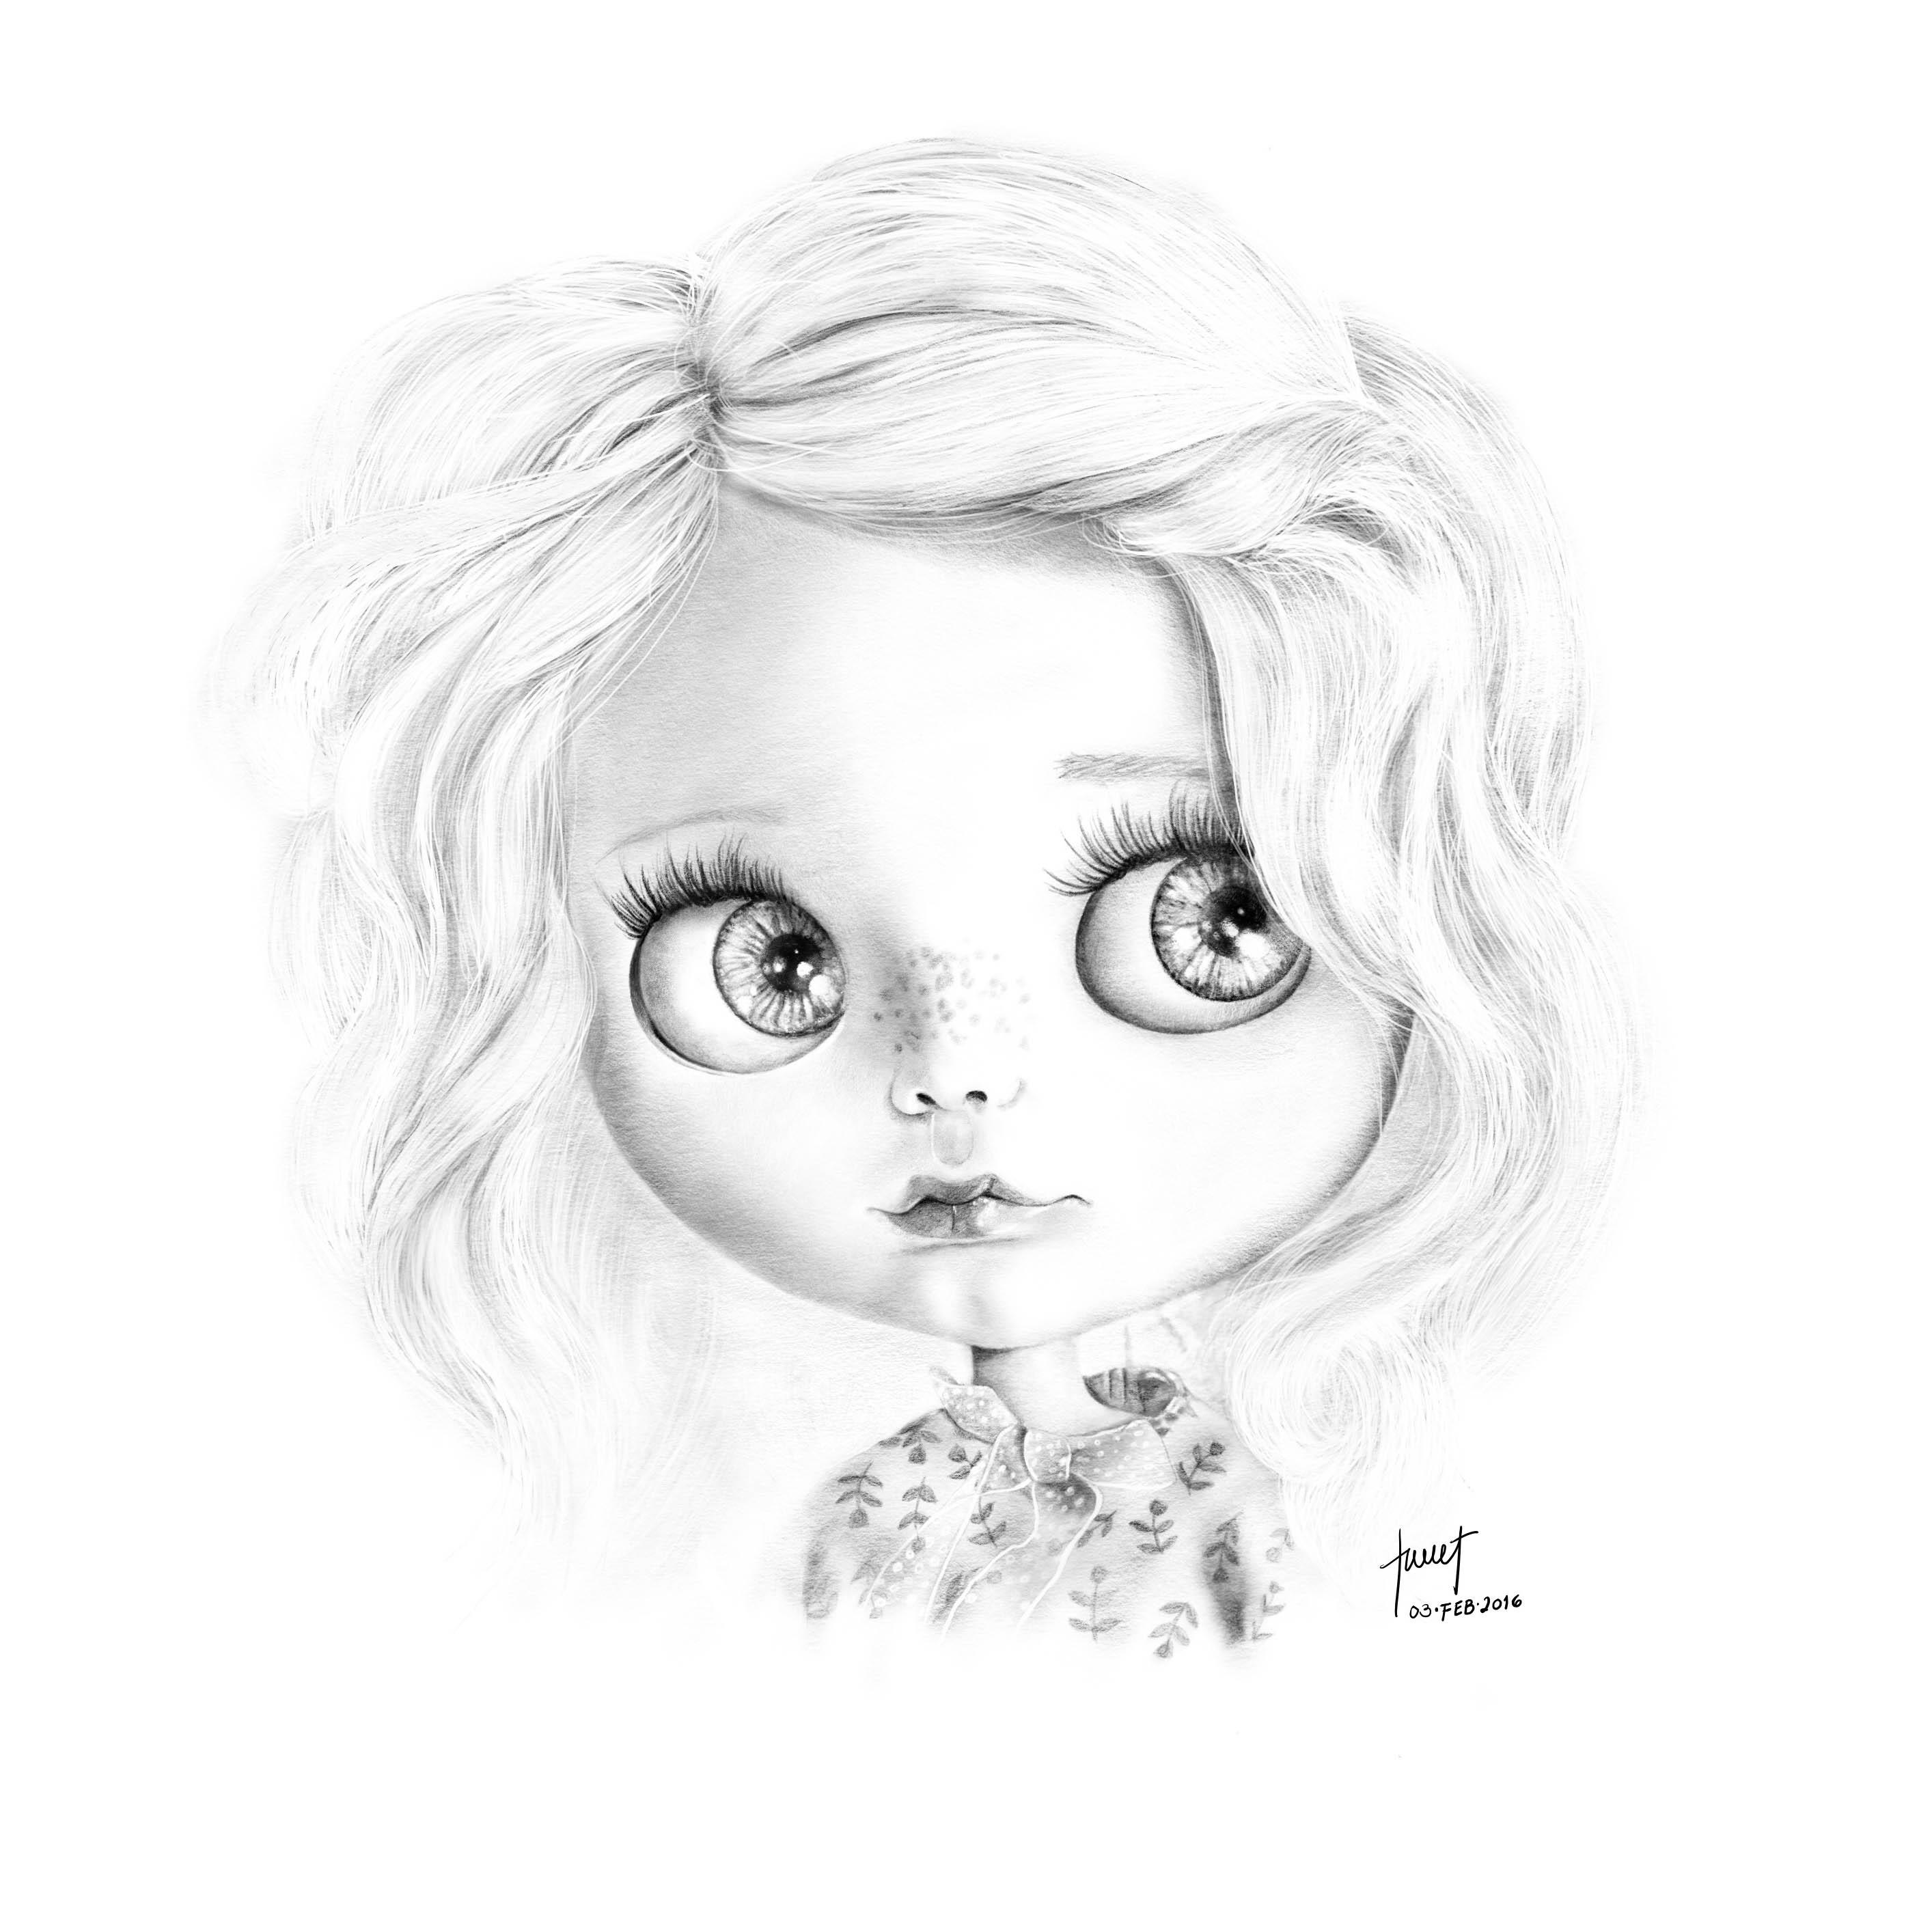 Pencil Illustration - Blythe Doll Portrait